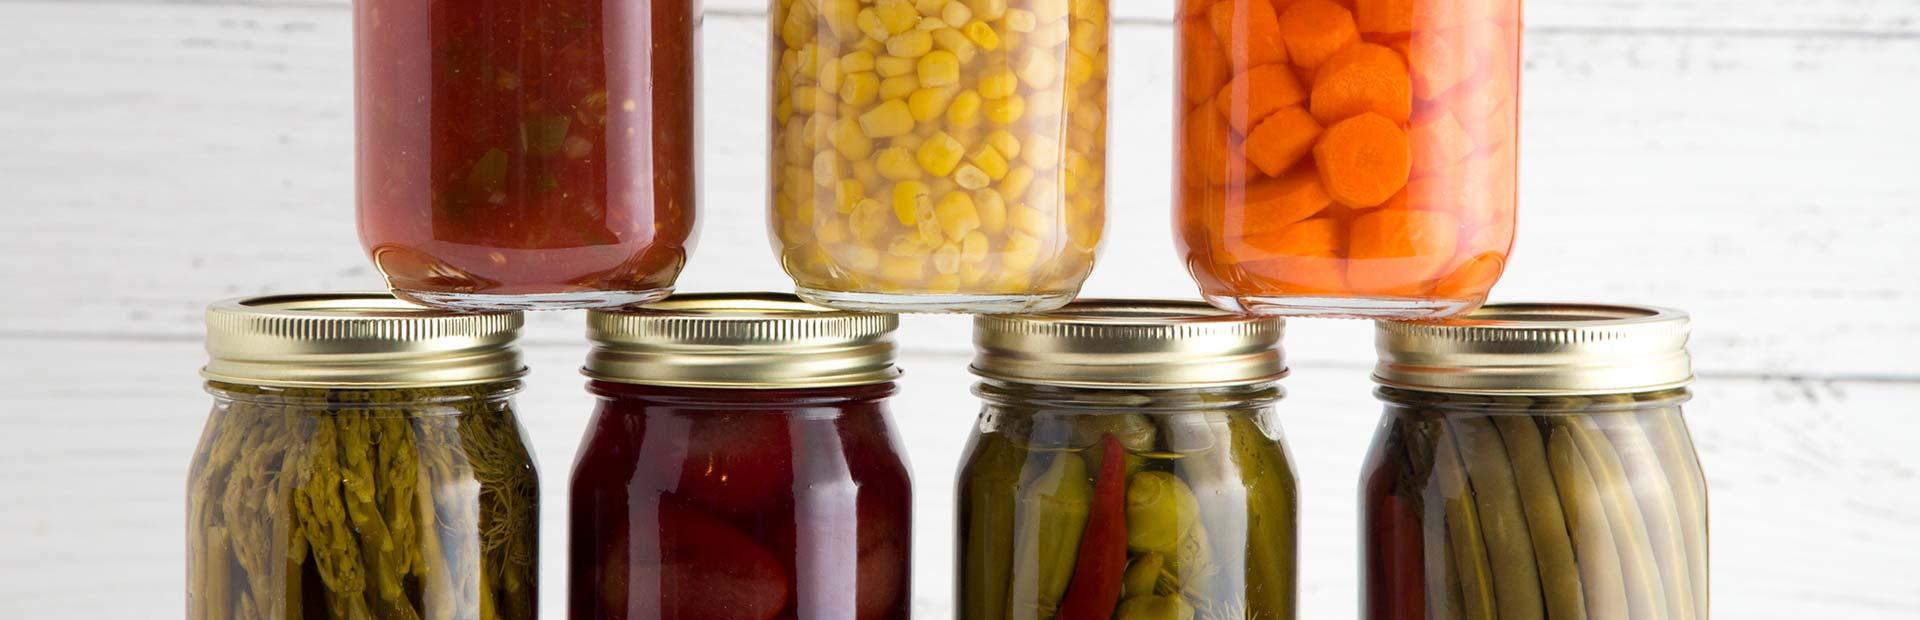 preservatitive-canning